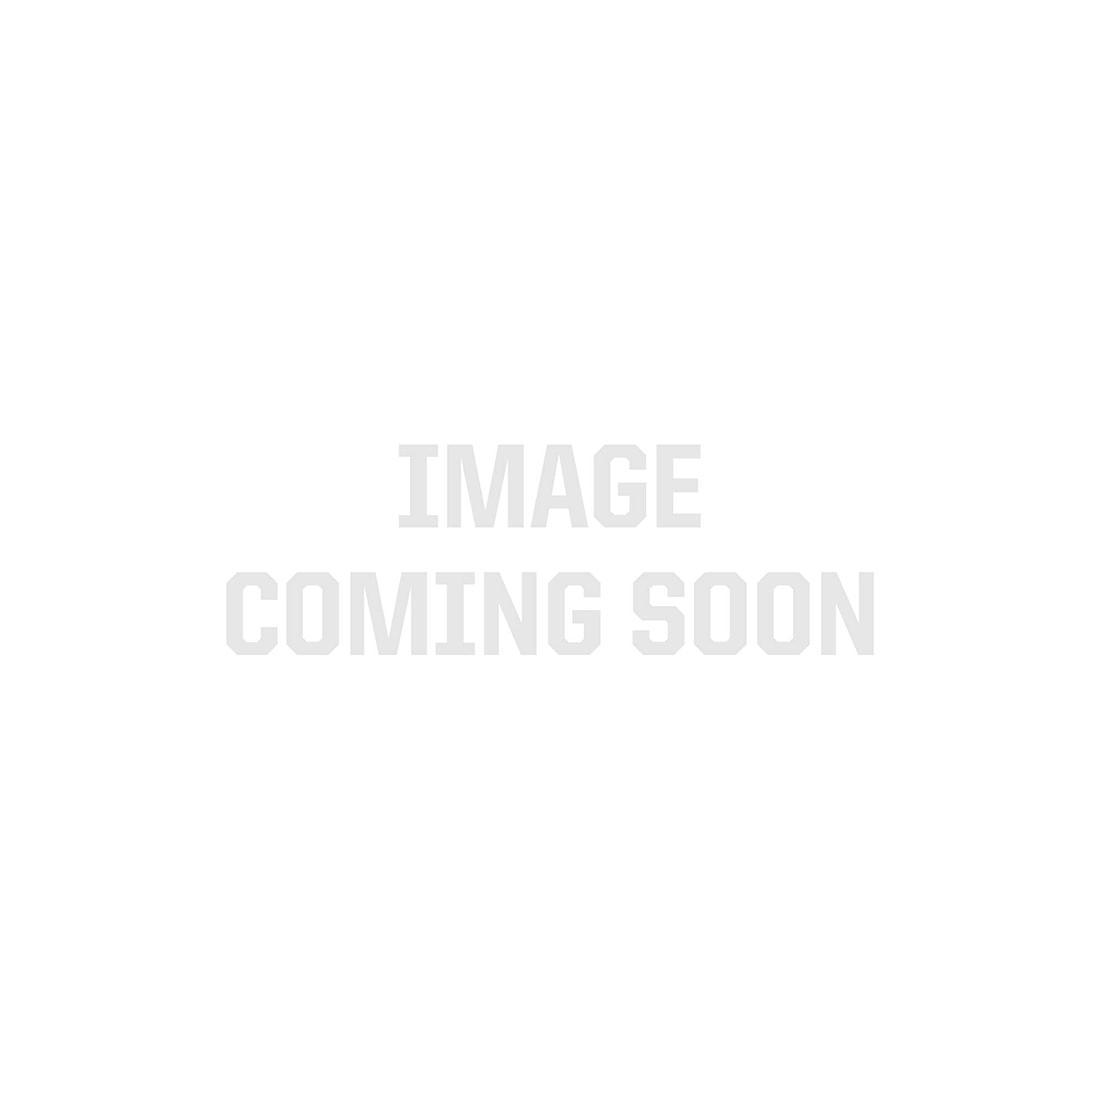 A15 Frosted Glass Dimmable LED Light Bulb, E26 (Medium) Base, 1.4 watt (Warm White)